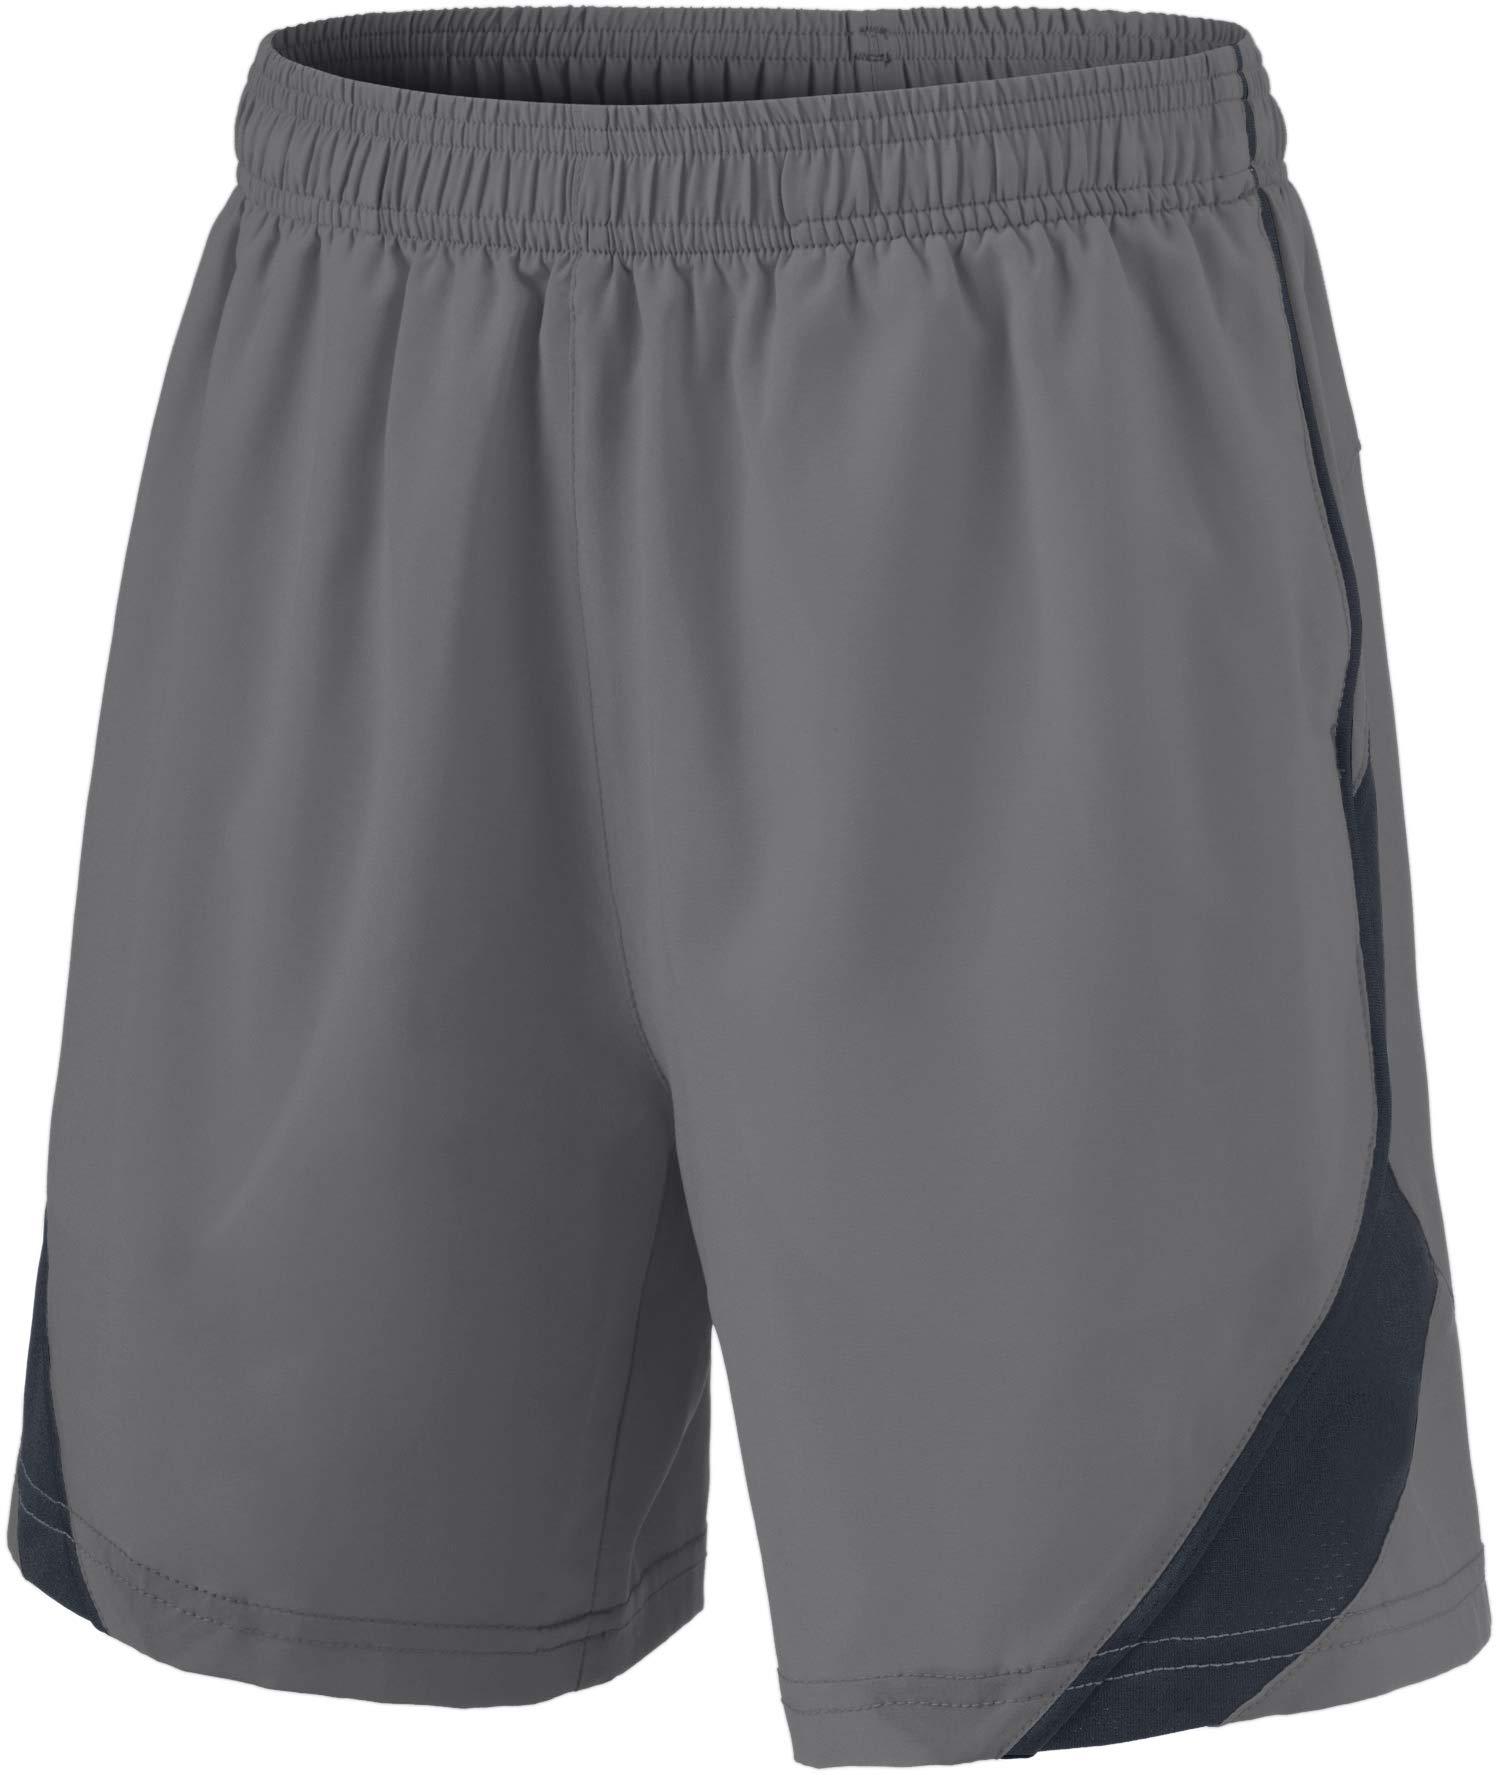 TSLA Boy's Active Shorts Sports Performance Youth HyperDri II w Pockets, Stretch Pace(kbh76) - Light Grey, Youth Large by TSLA